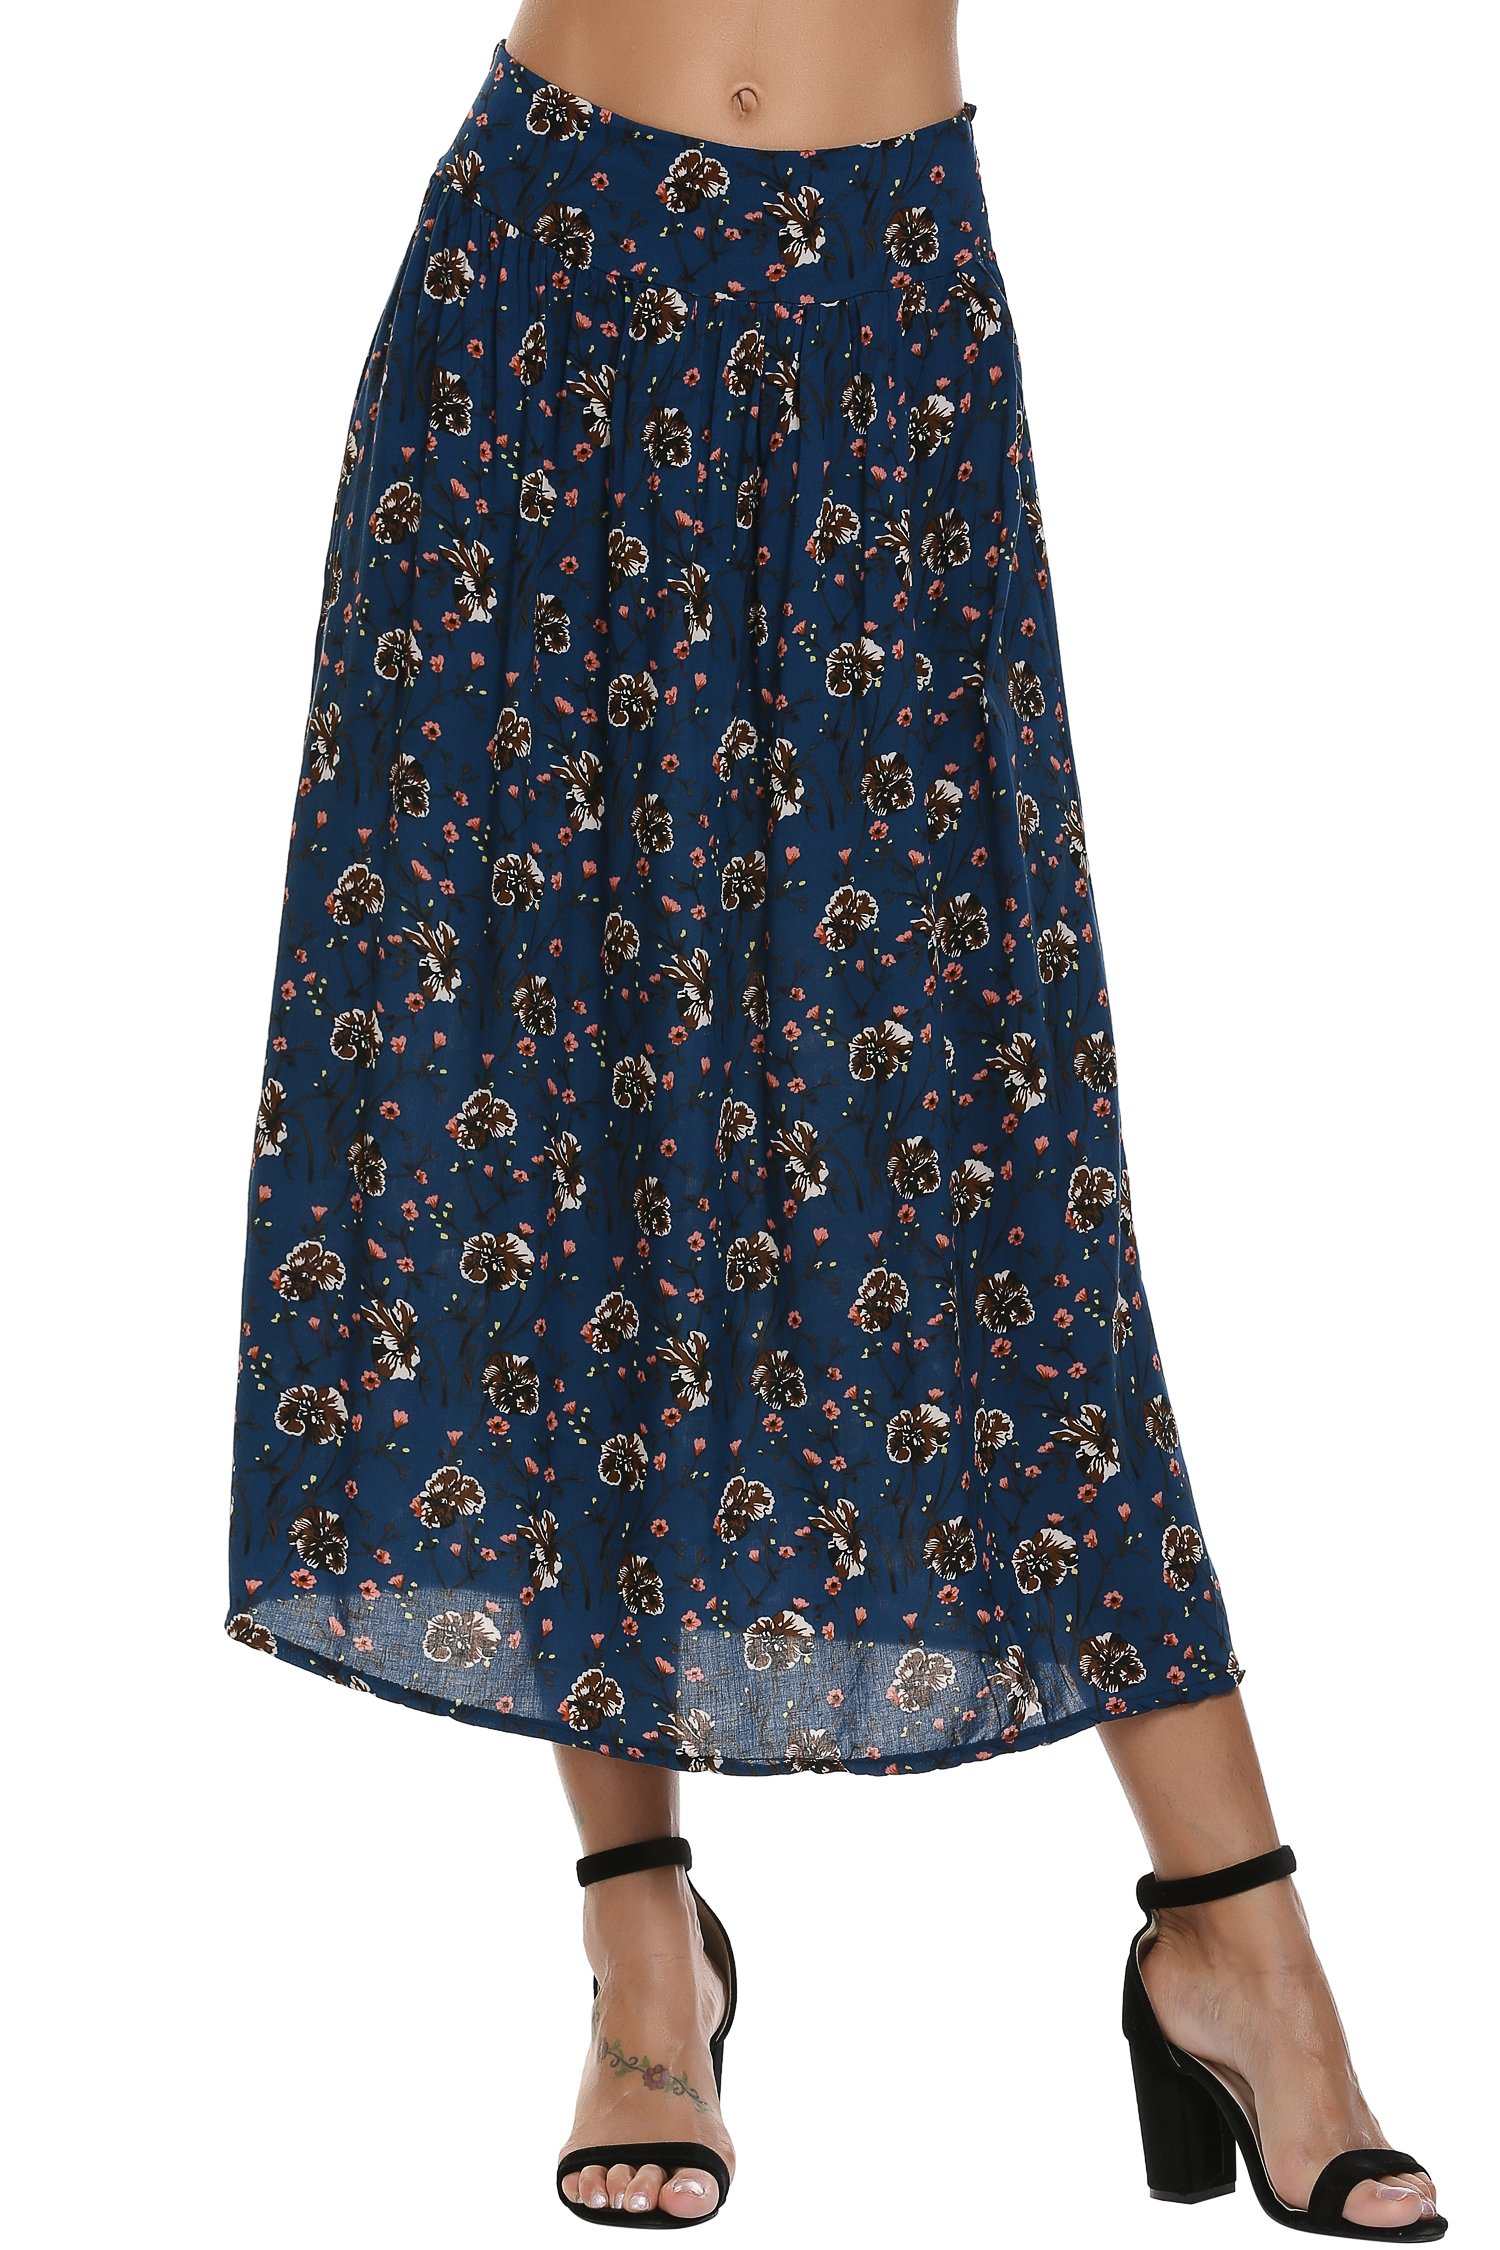 Zeagoo Women's Fashion Solid Color Flowy Split Long Maxi Skirt,Blue,Medium